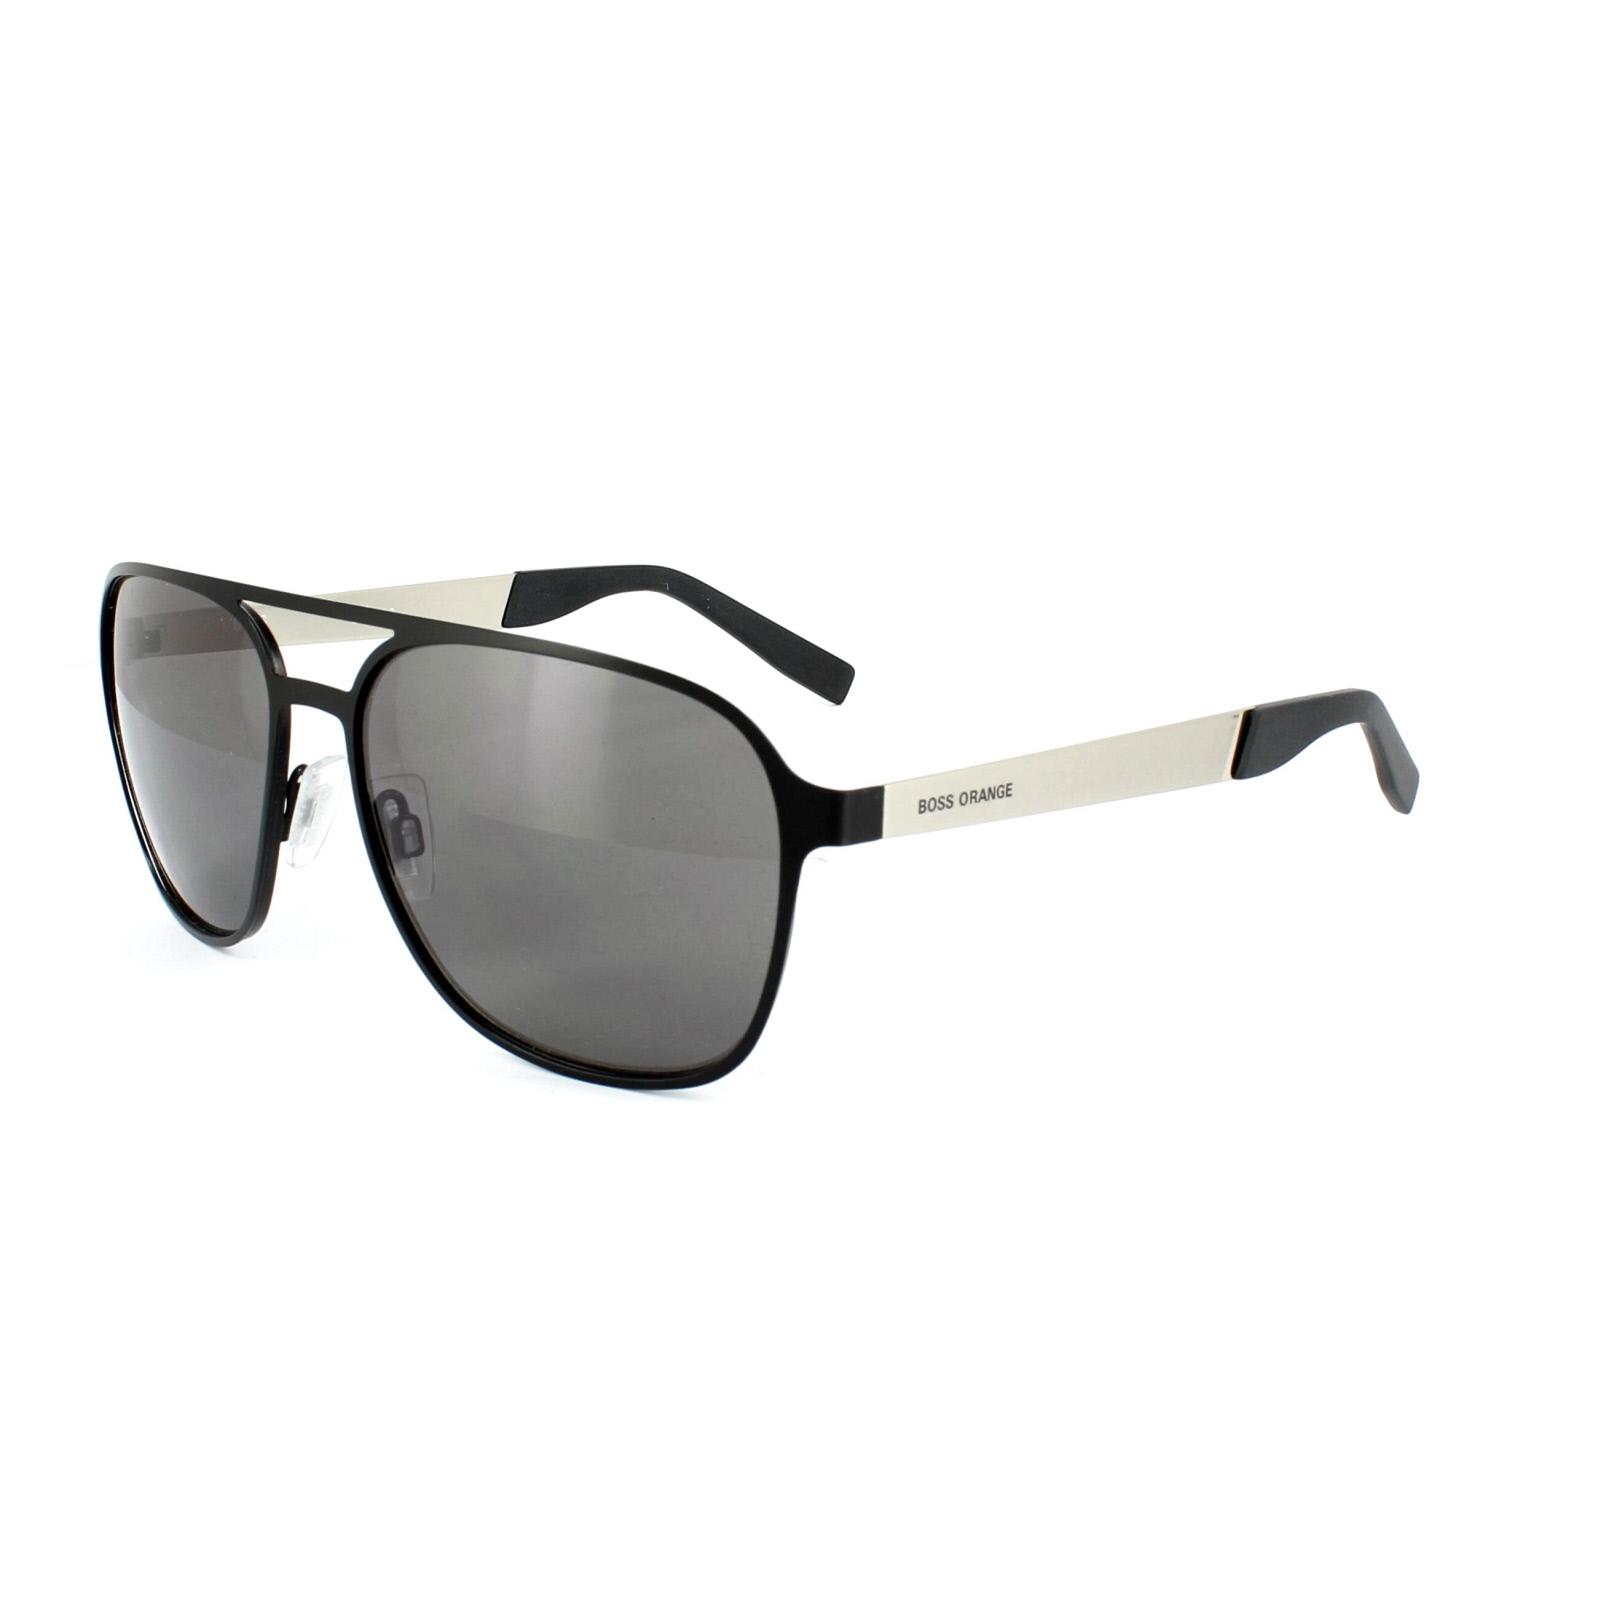 40bae0a6cc Cheap Boss Orange 0226 Sunglasses - Discounted Sunglasses